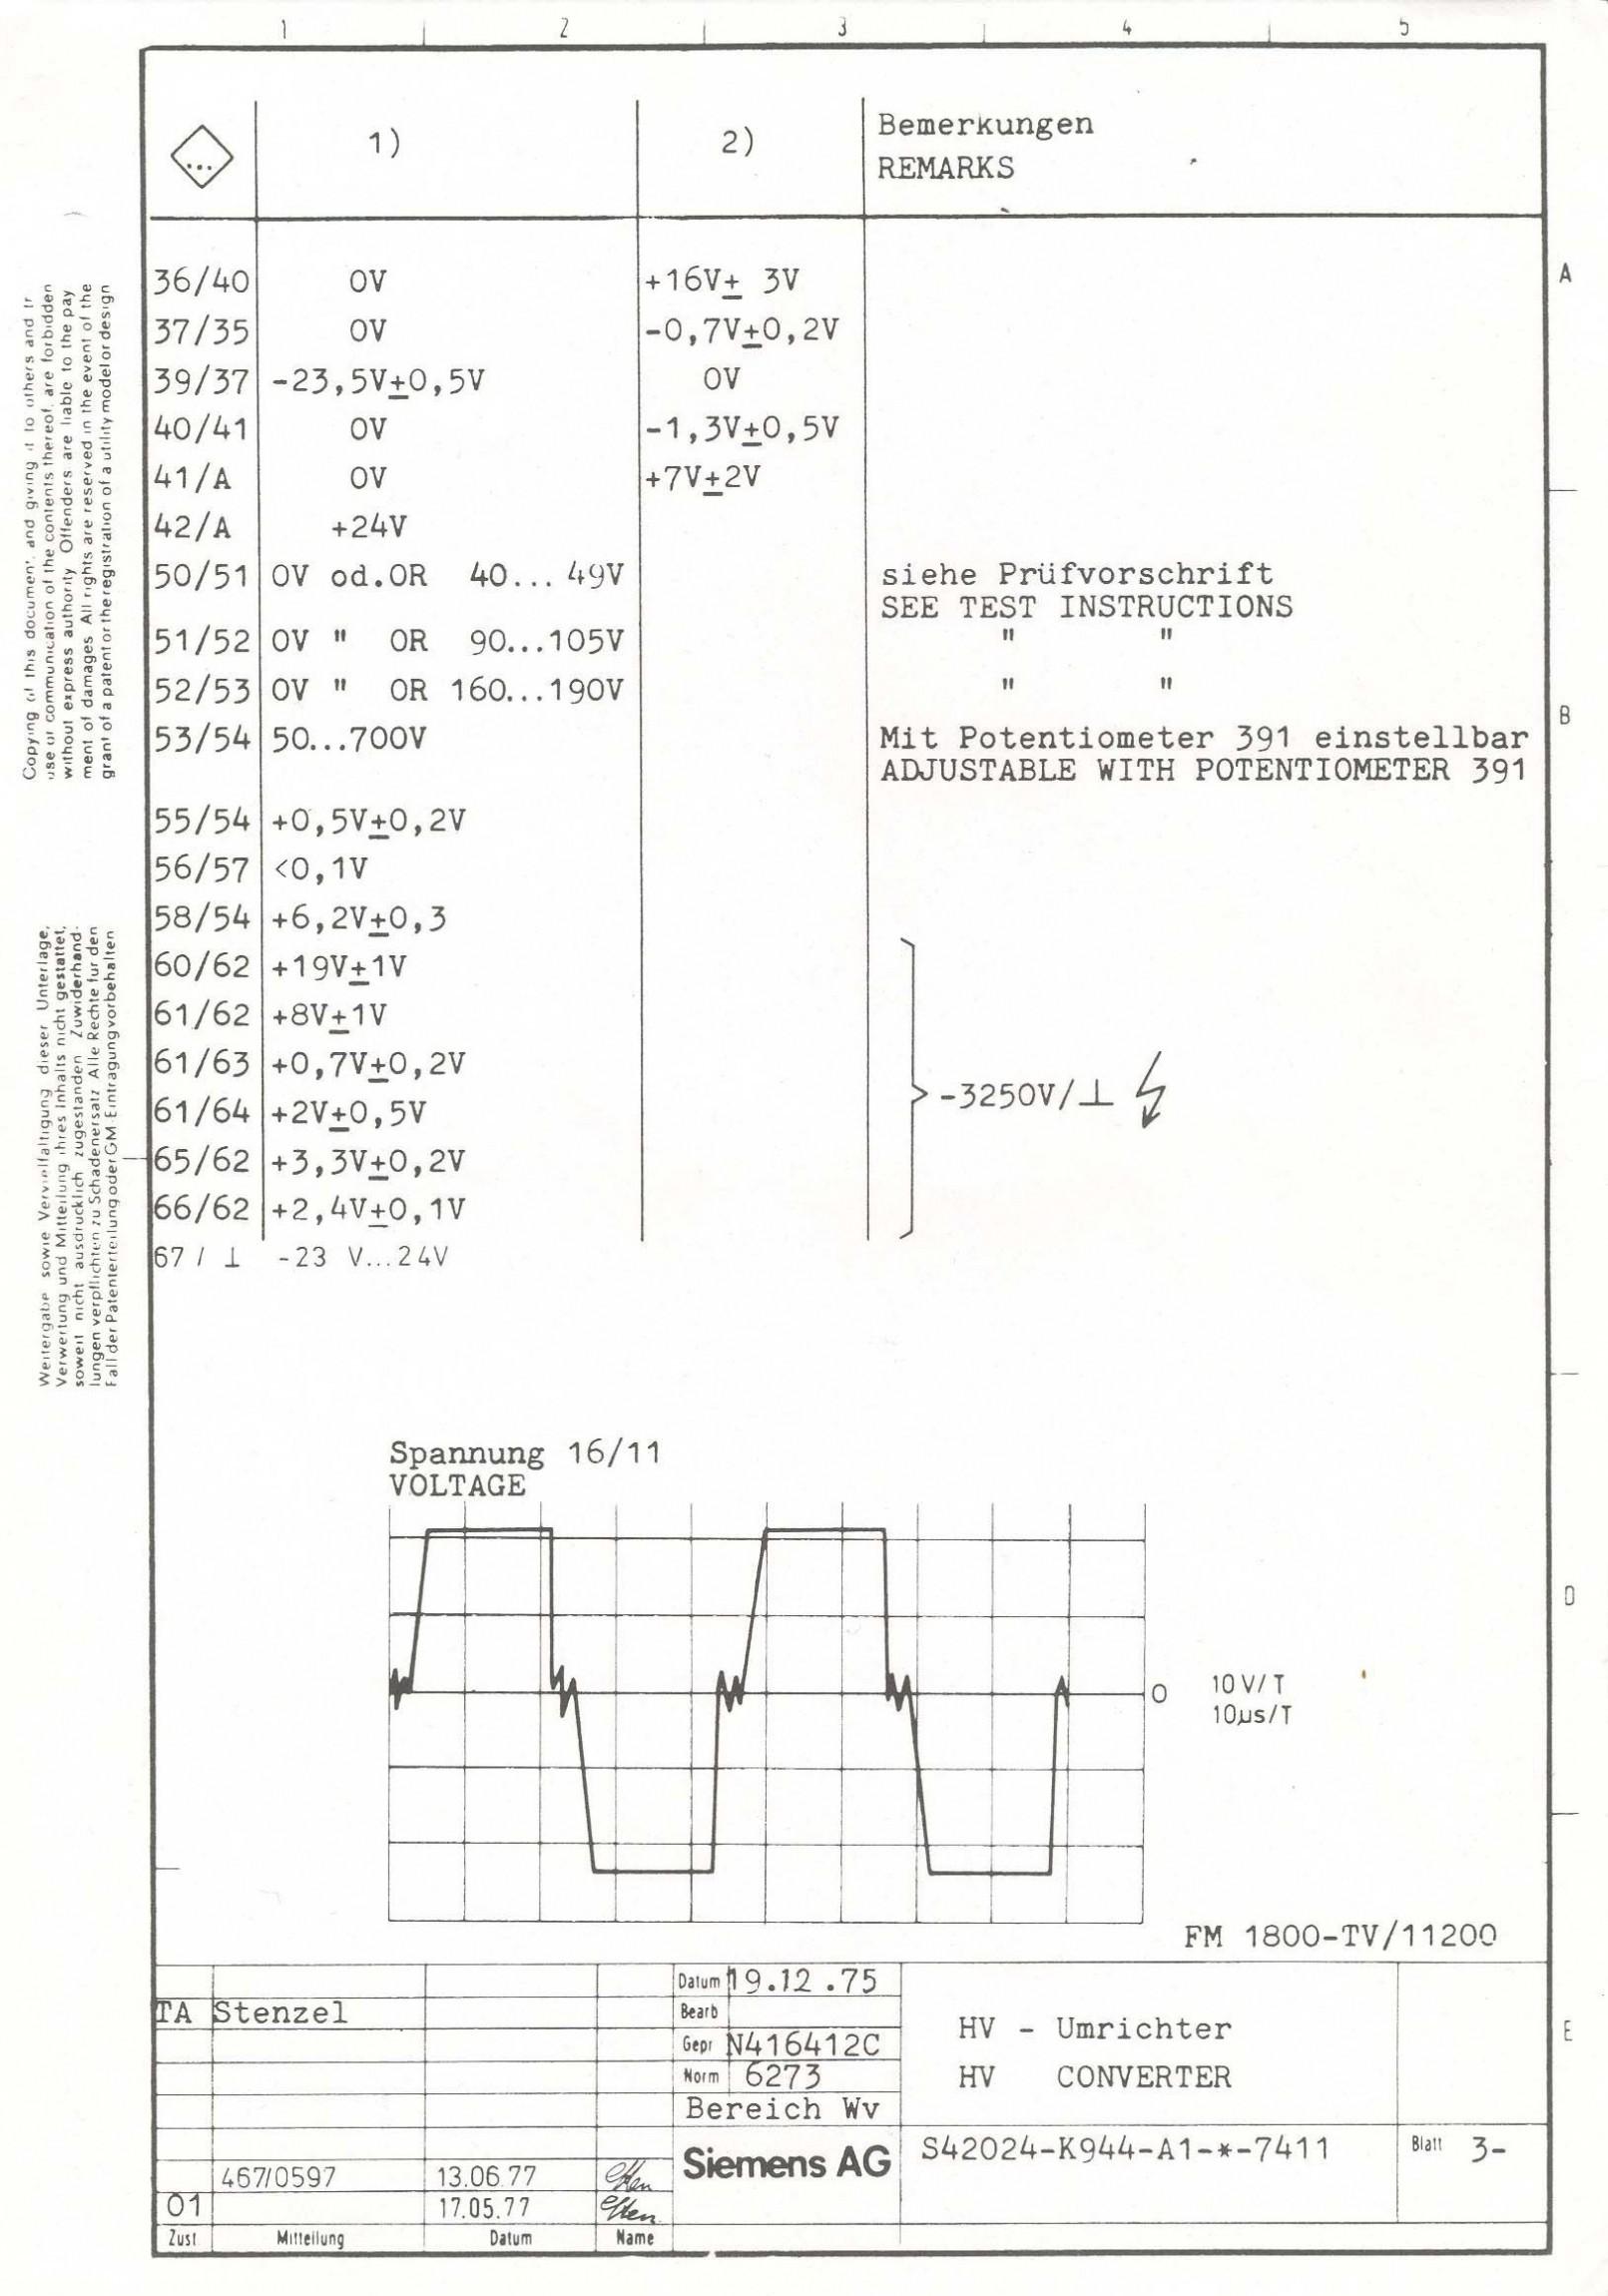 50 Amp Rv Plug Wiring Diagram 50 Amp Twist Lock Plug Wiring Diagram Rate 4 Prong Generator Plug Of 50 Amp Rv Plug Wiring Diagram